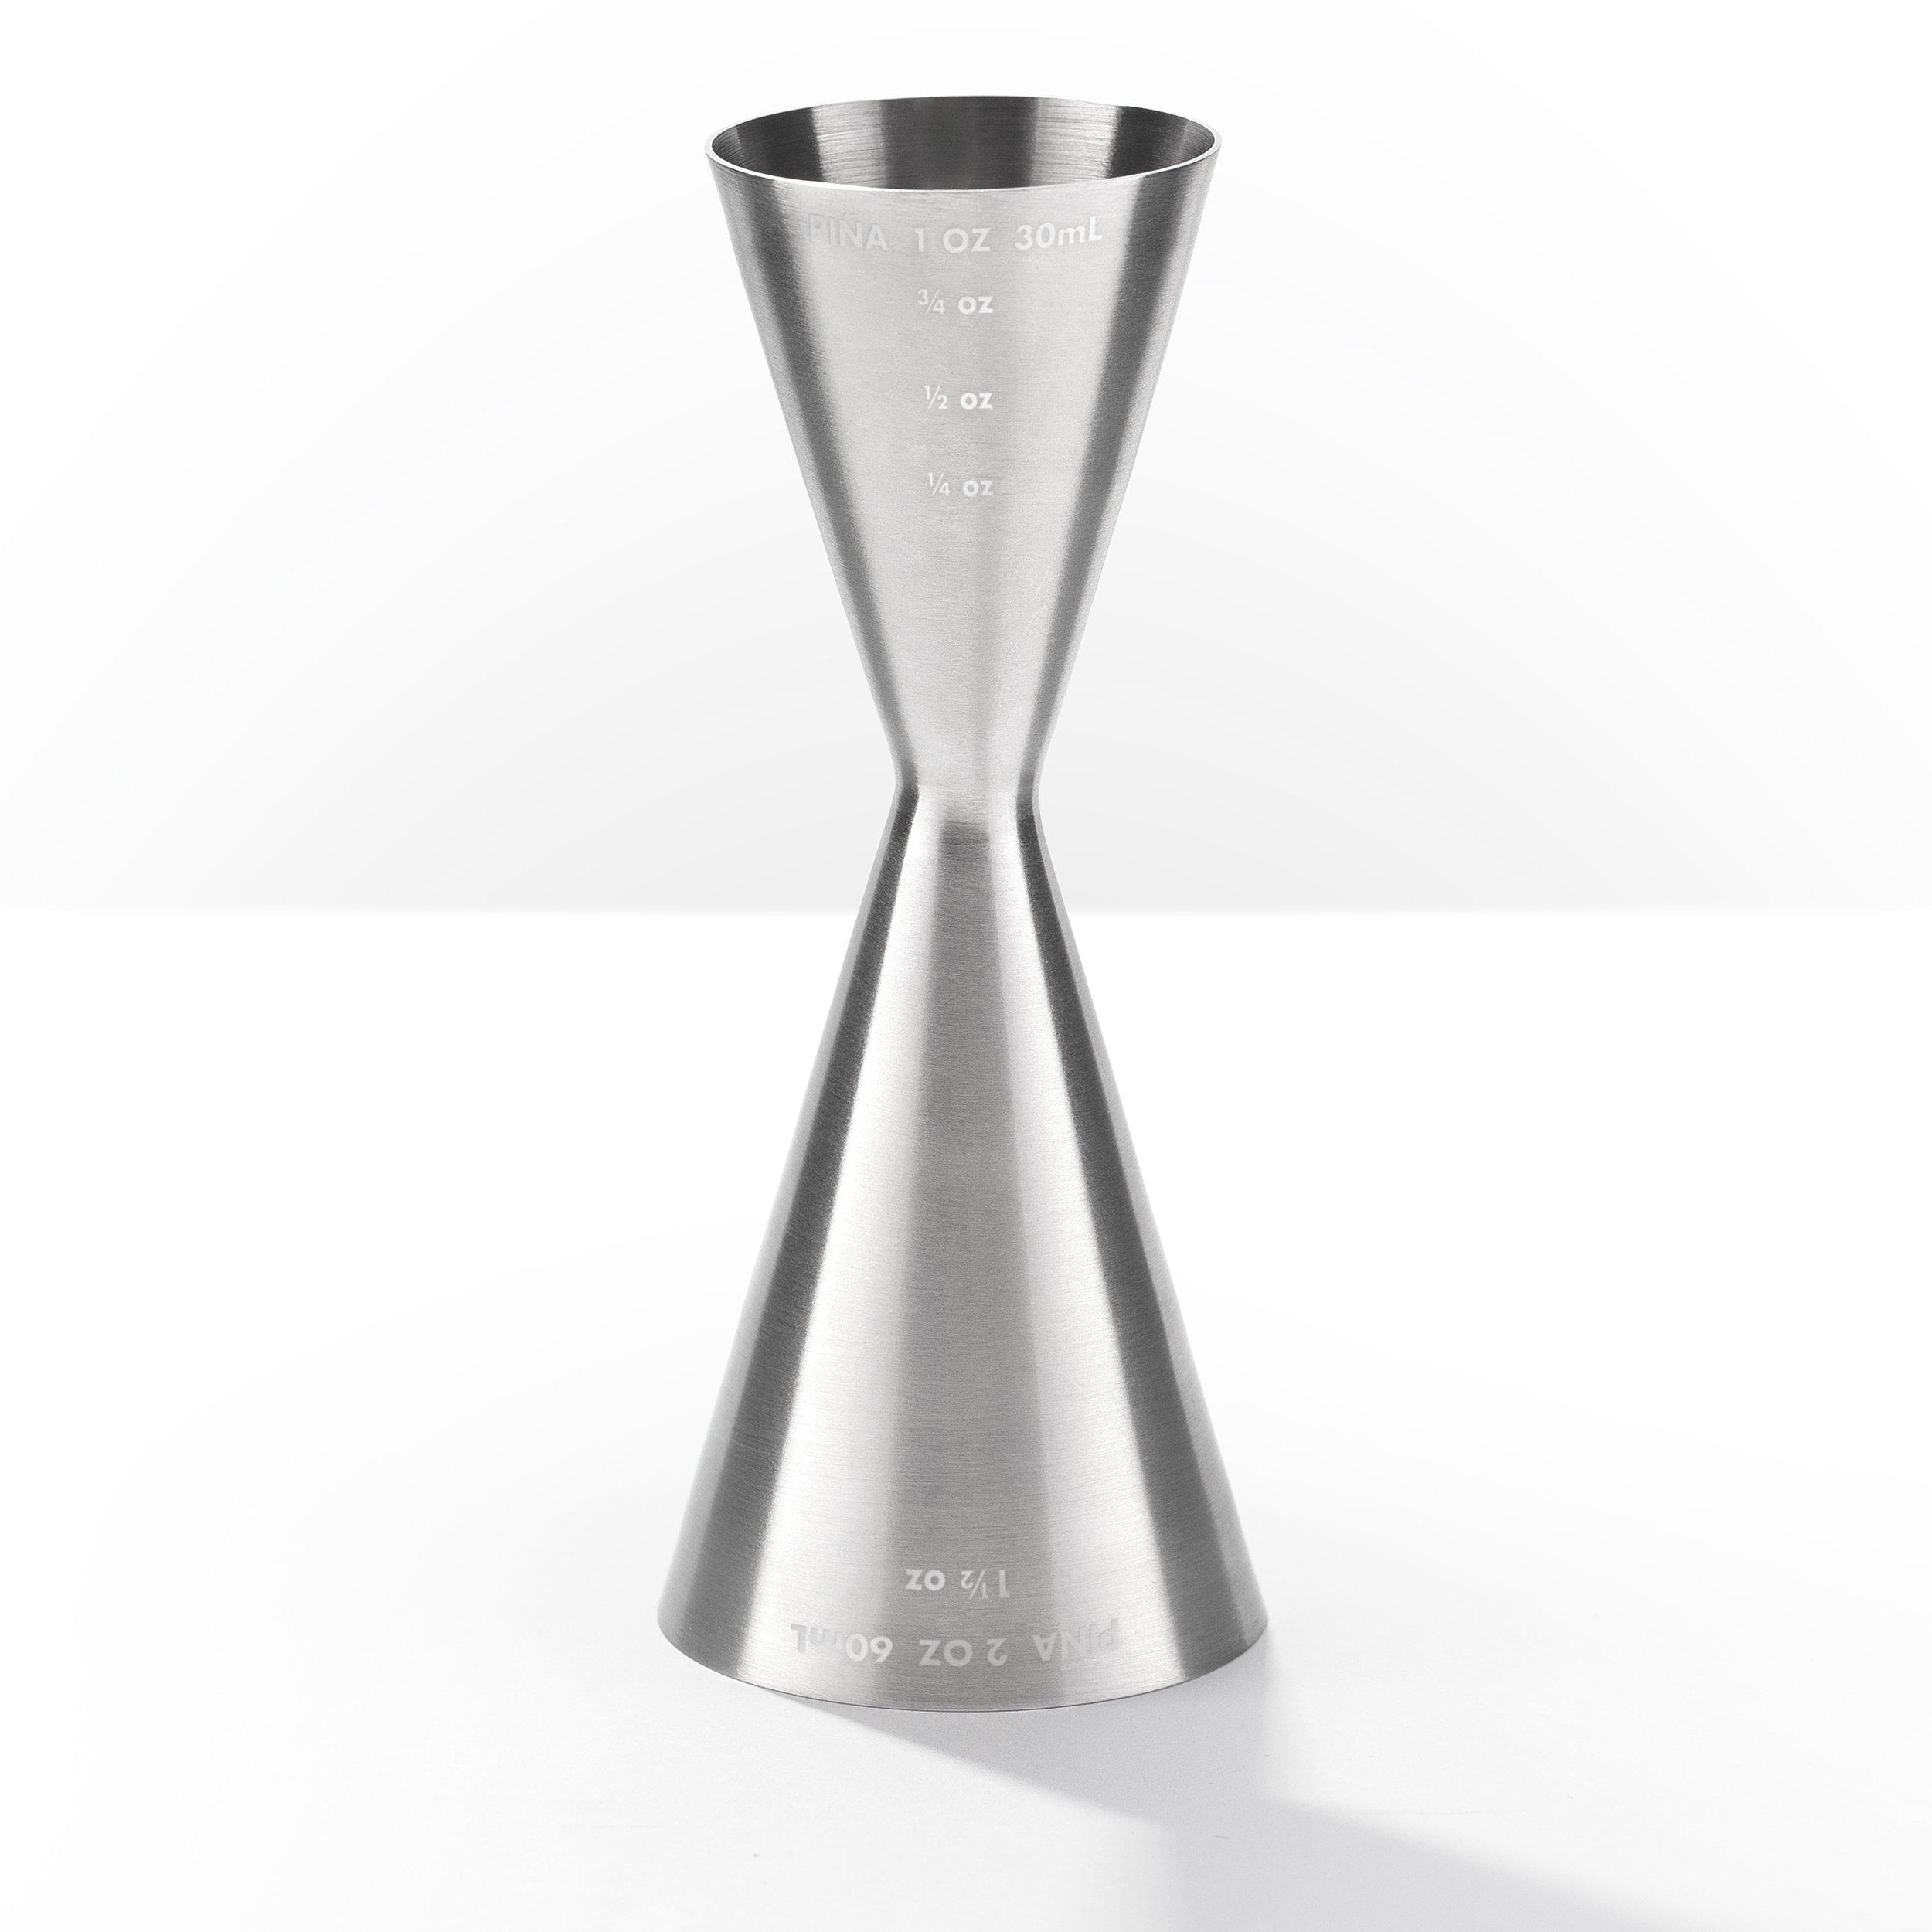 Piña Barware Slim Stainless Steel Commercial 2oz. / 1oz. Slim Style Measuring Jigger Bar Tool by Piña Barware (Image #1)